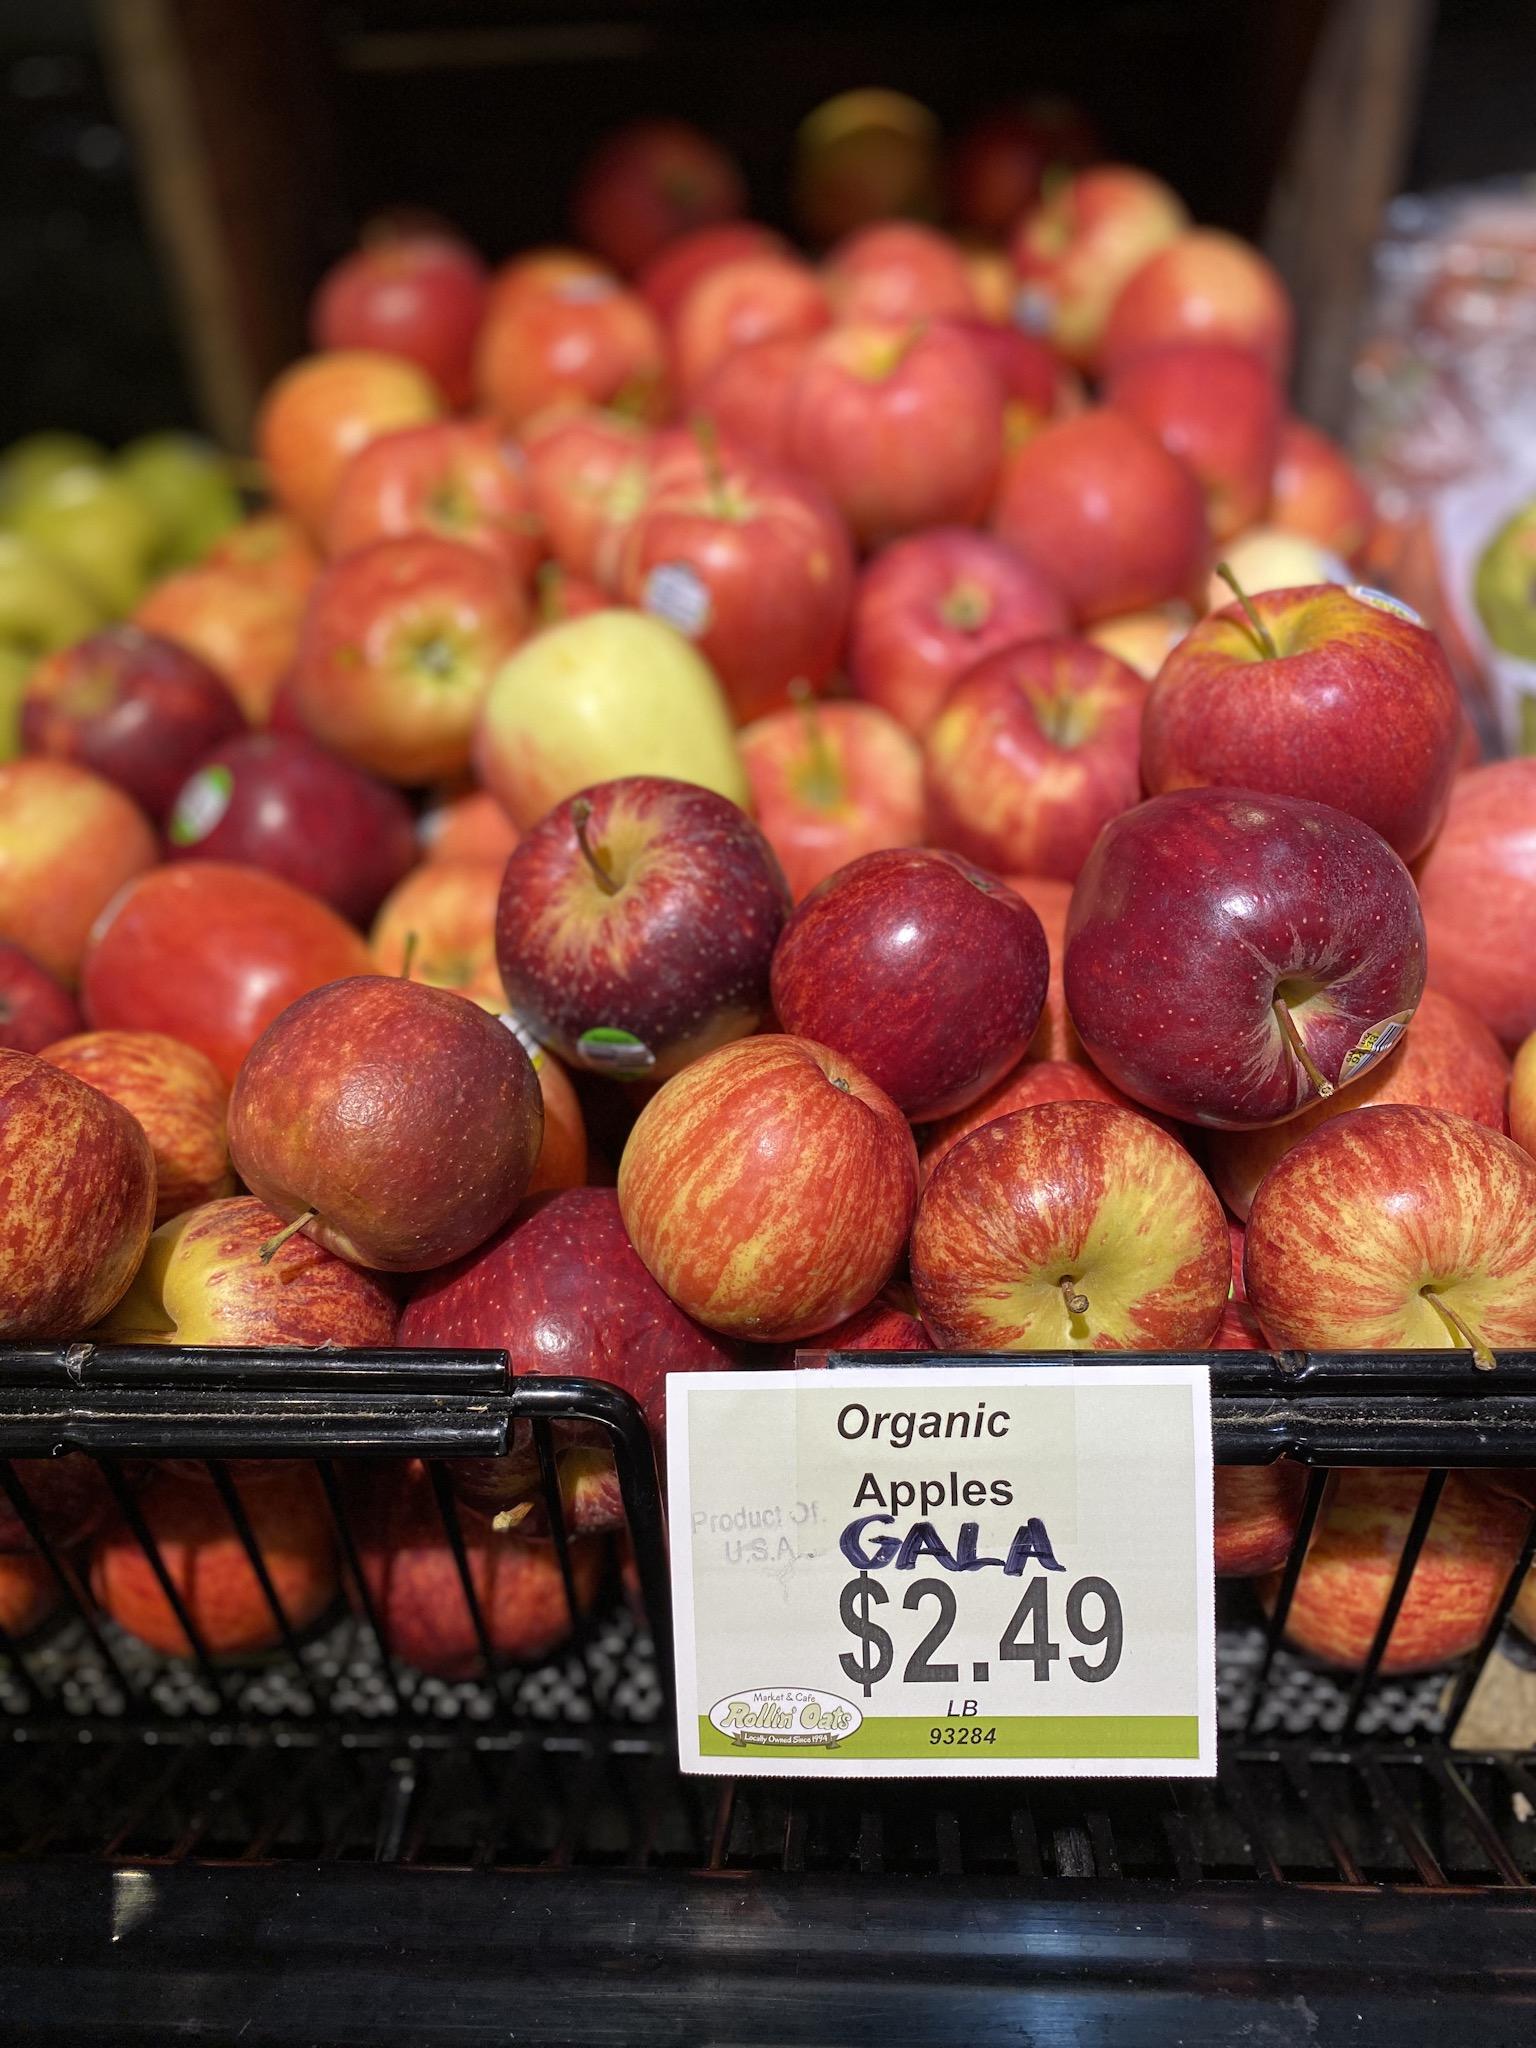 Organic Gala Apples at Rollin' Oats